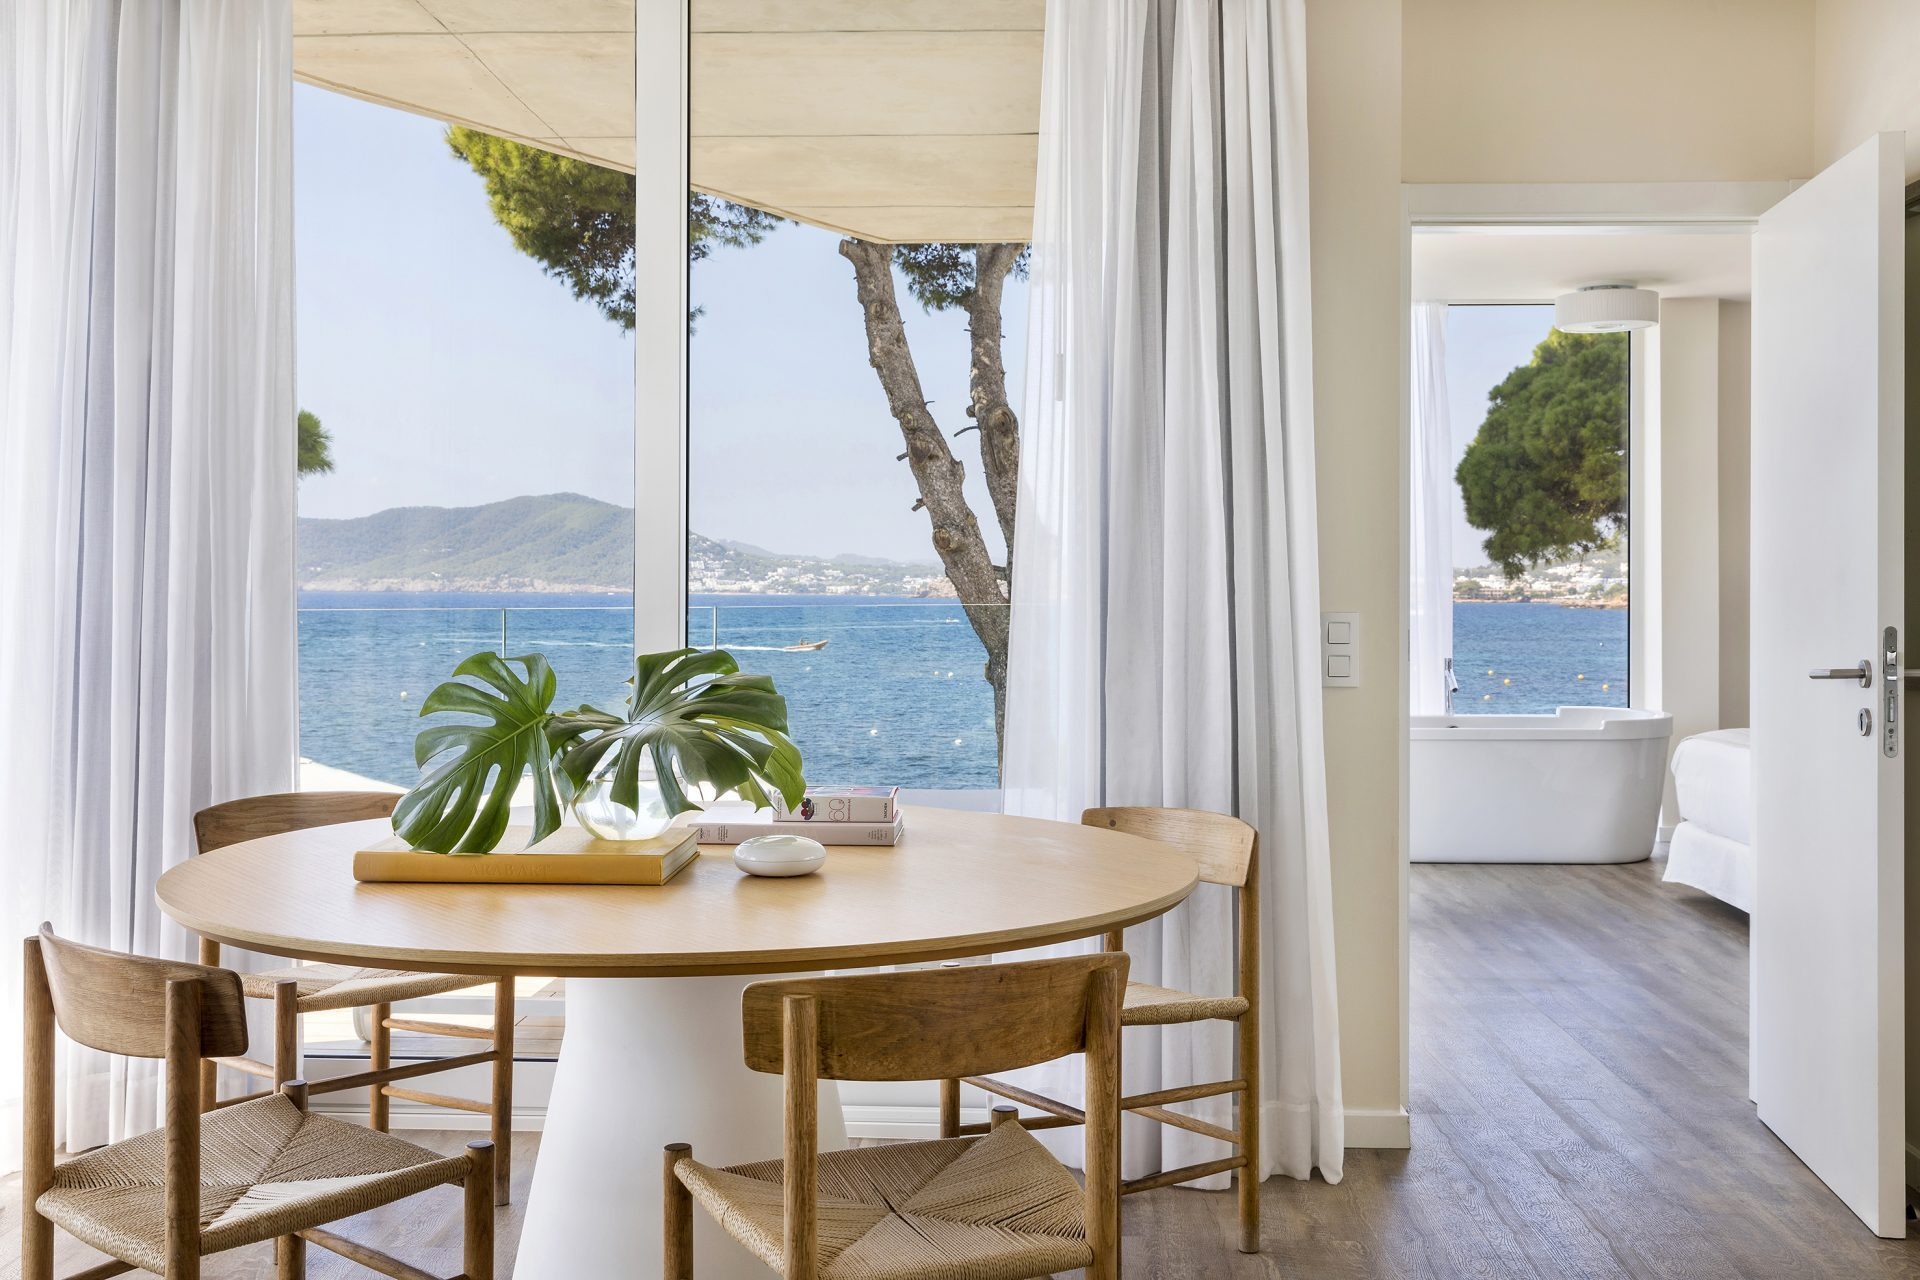 125bME Ibiza Suite Personality